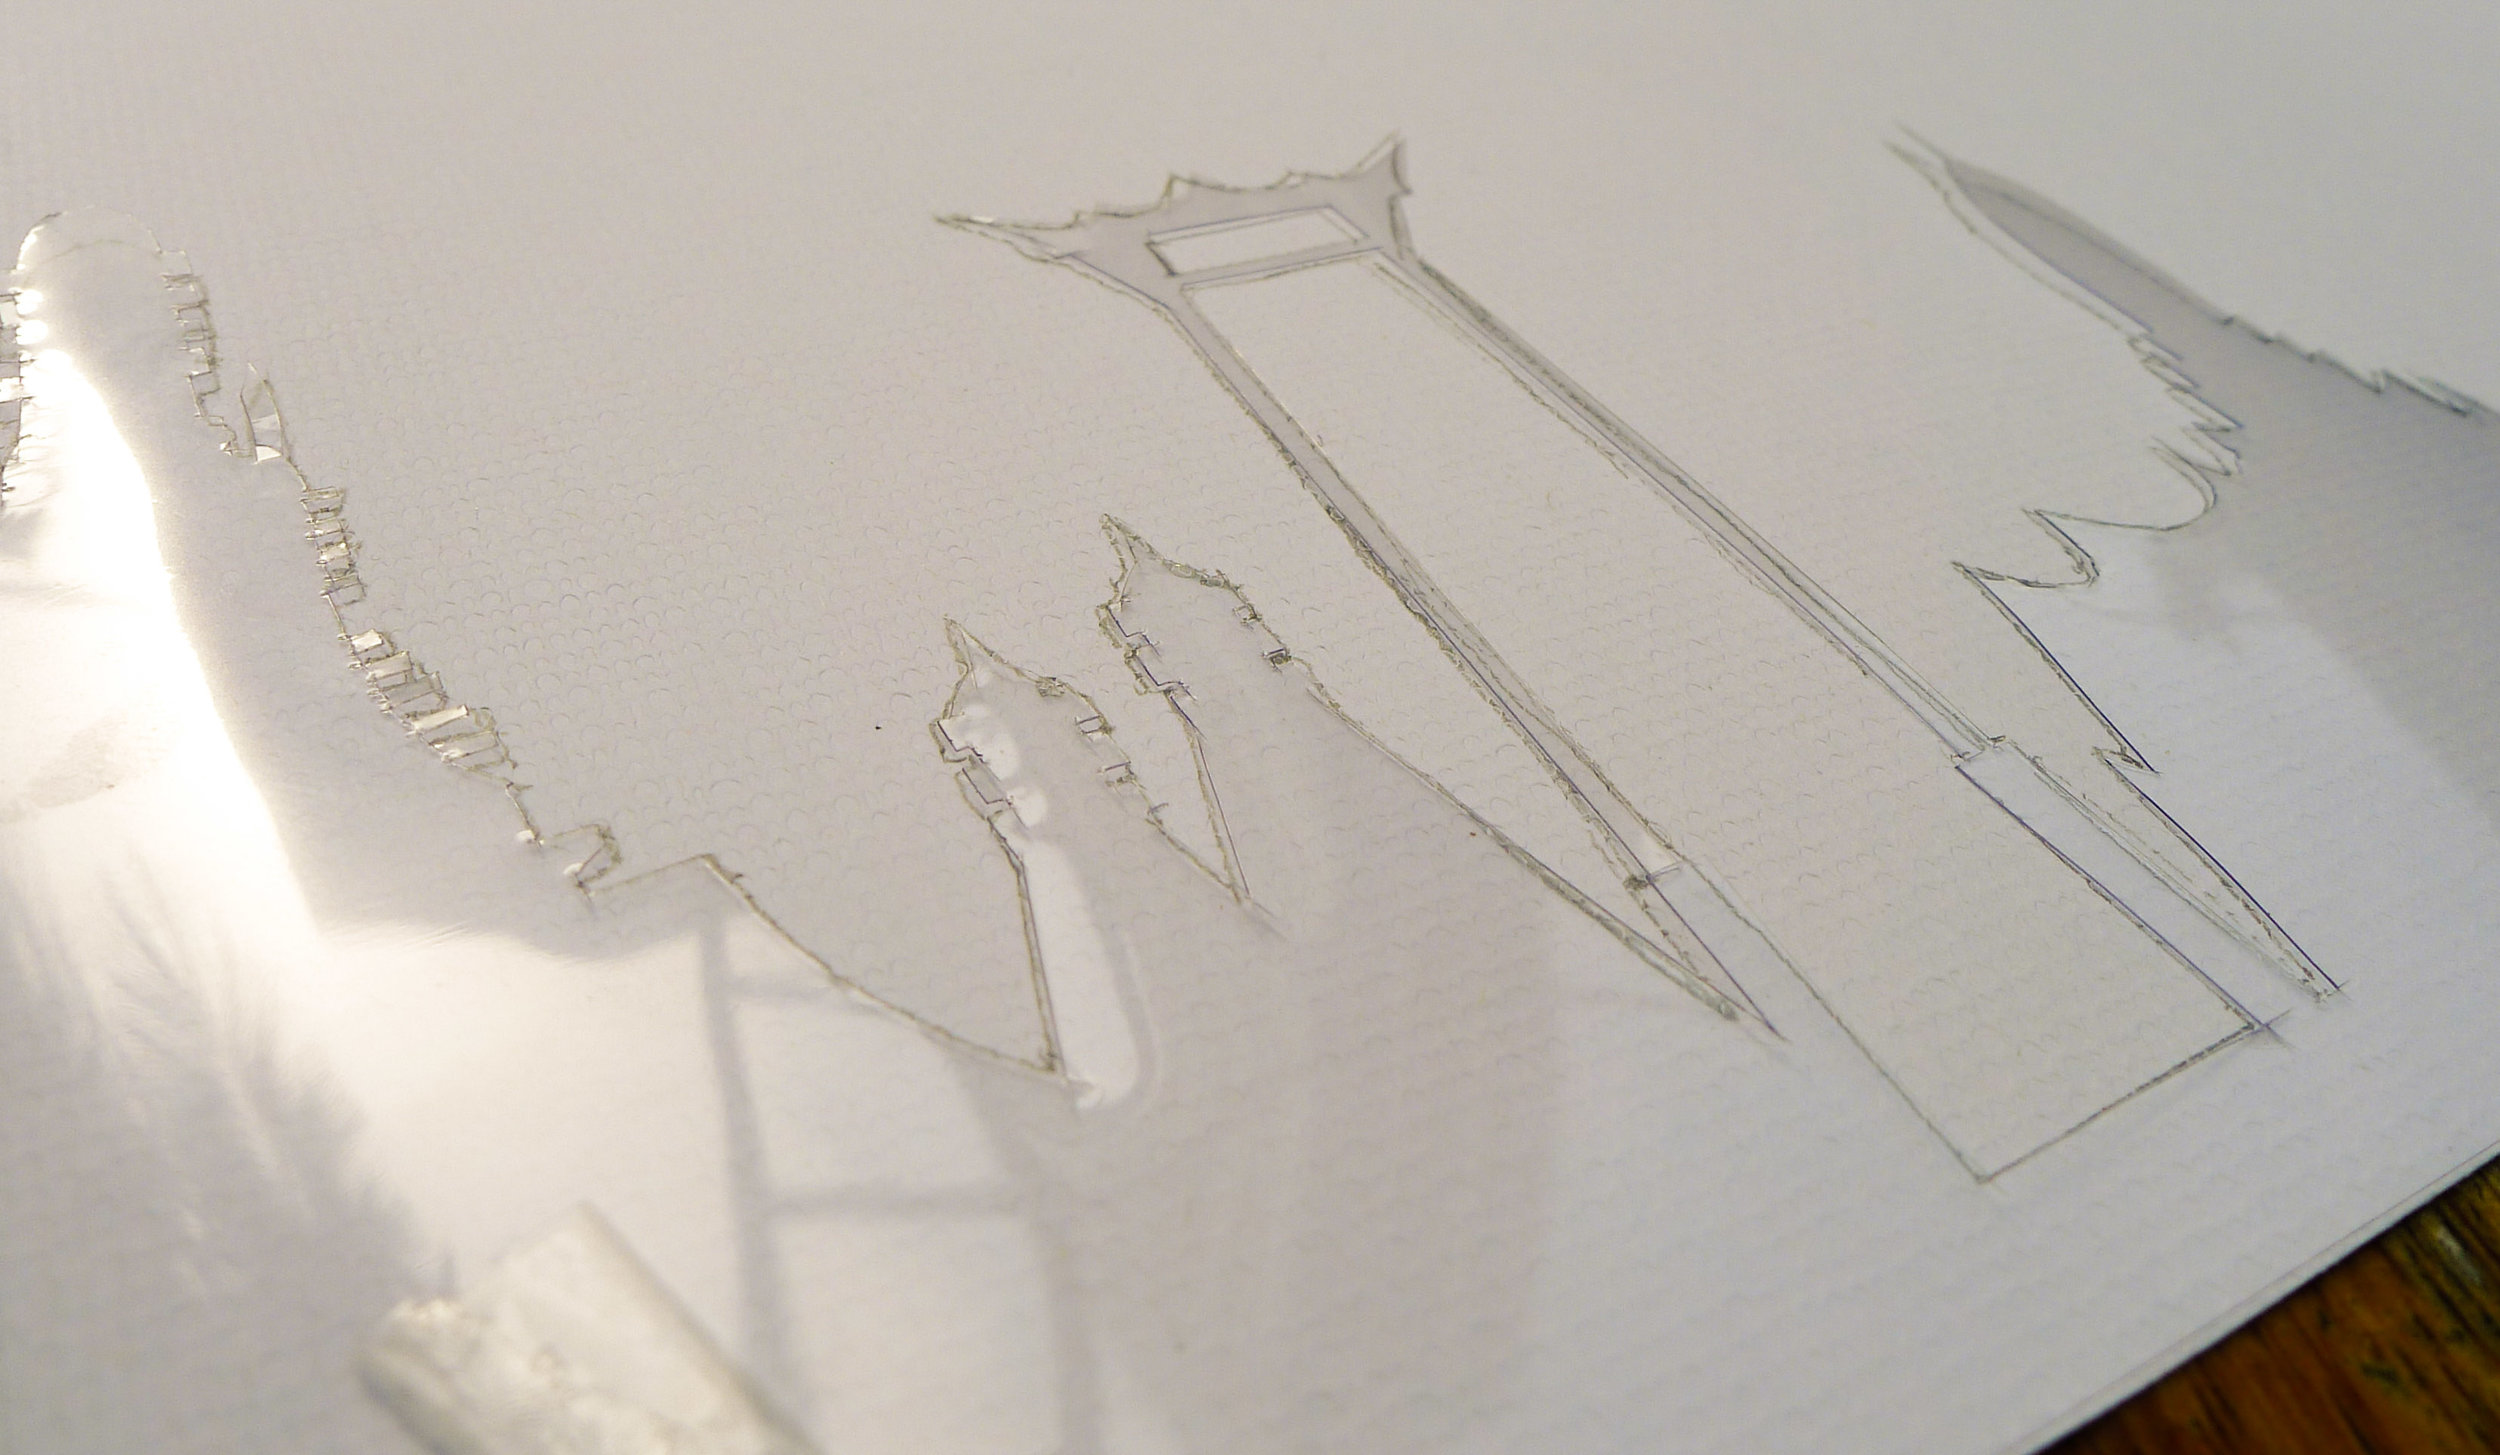 2017_DIY Lightbox_Tracing Layers on Watercolor Paper.jpg